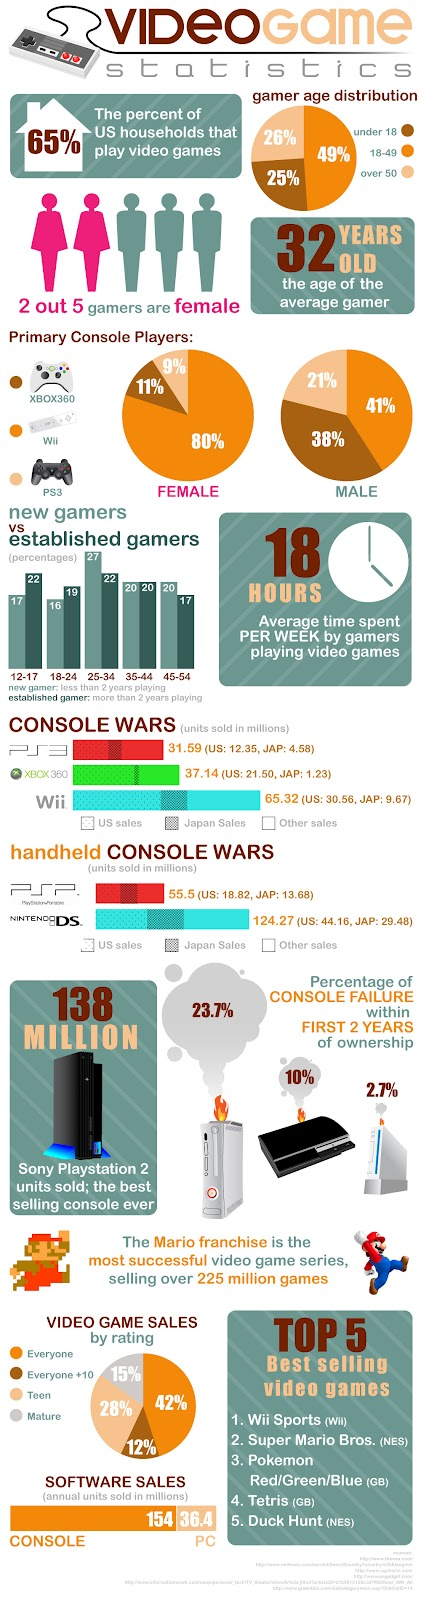 InfografIa de Video Juegos